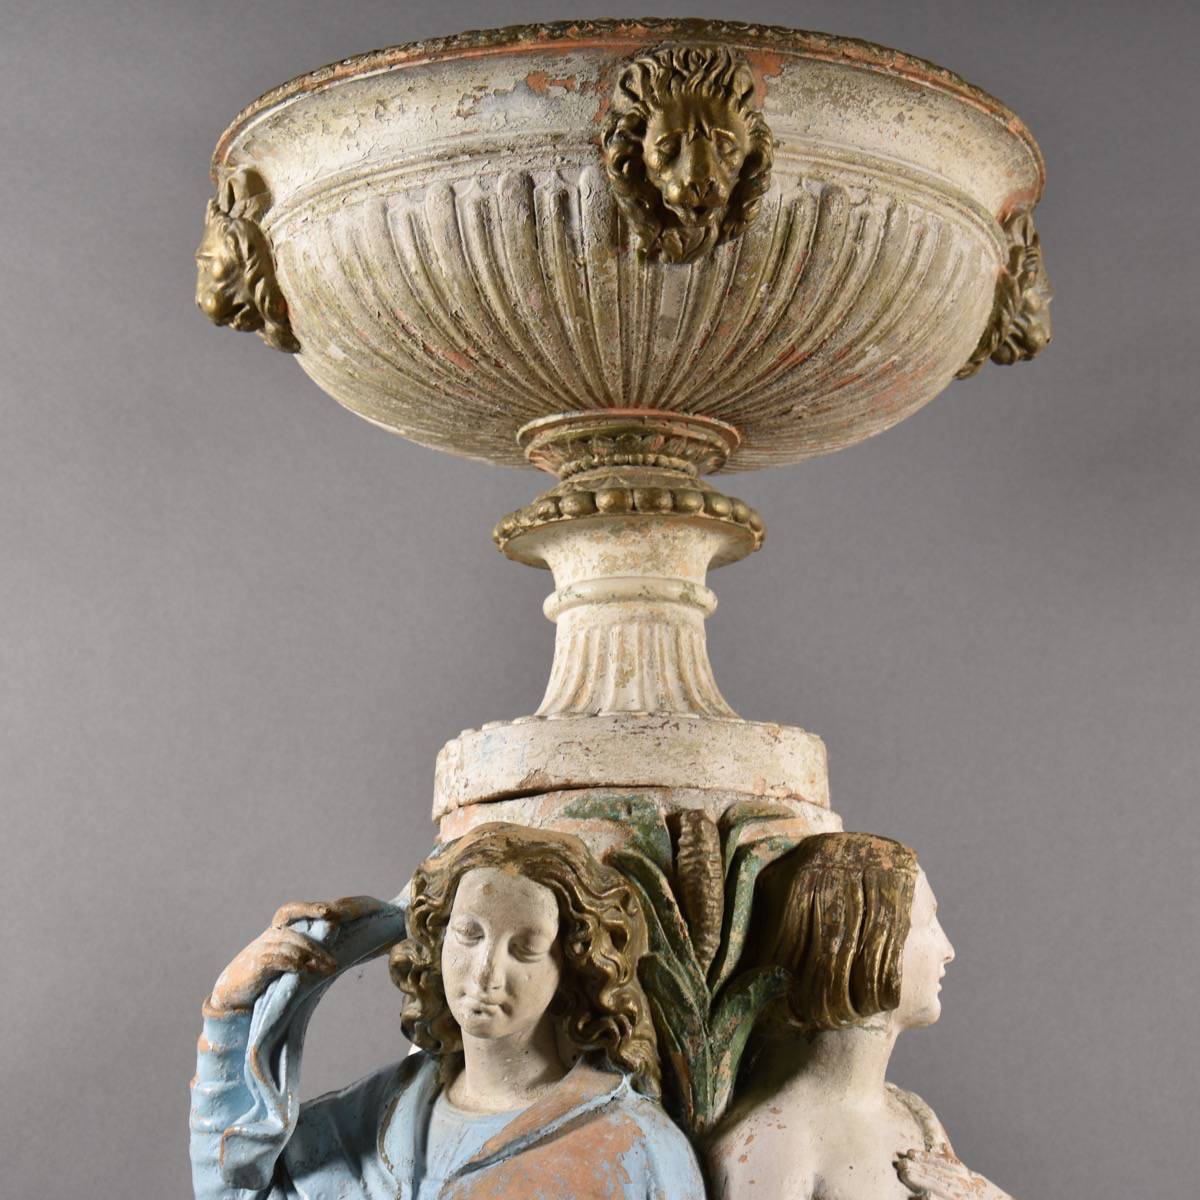 Terracotta Urn Antique Garden Ornaments